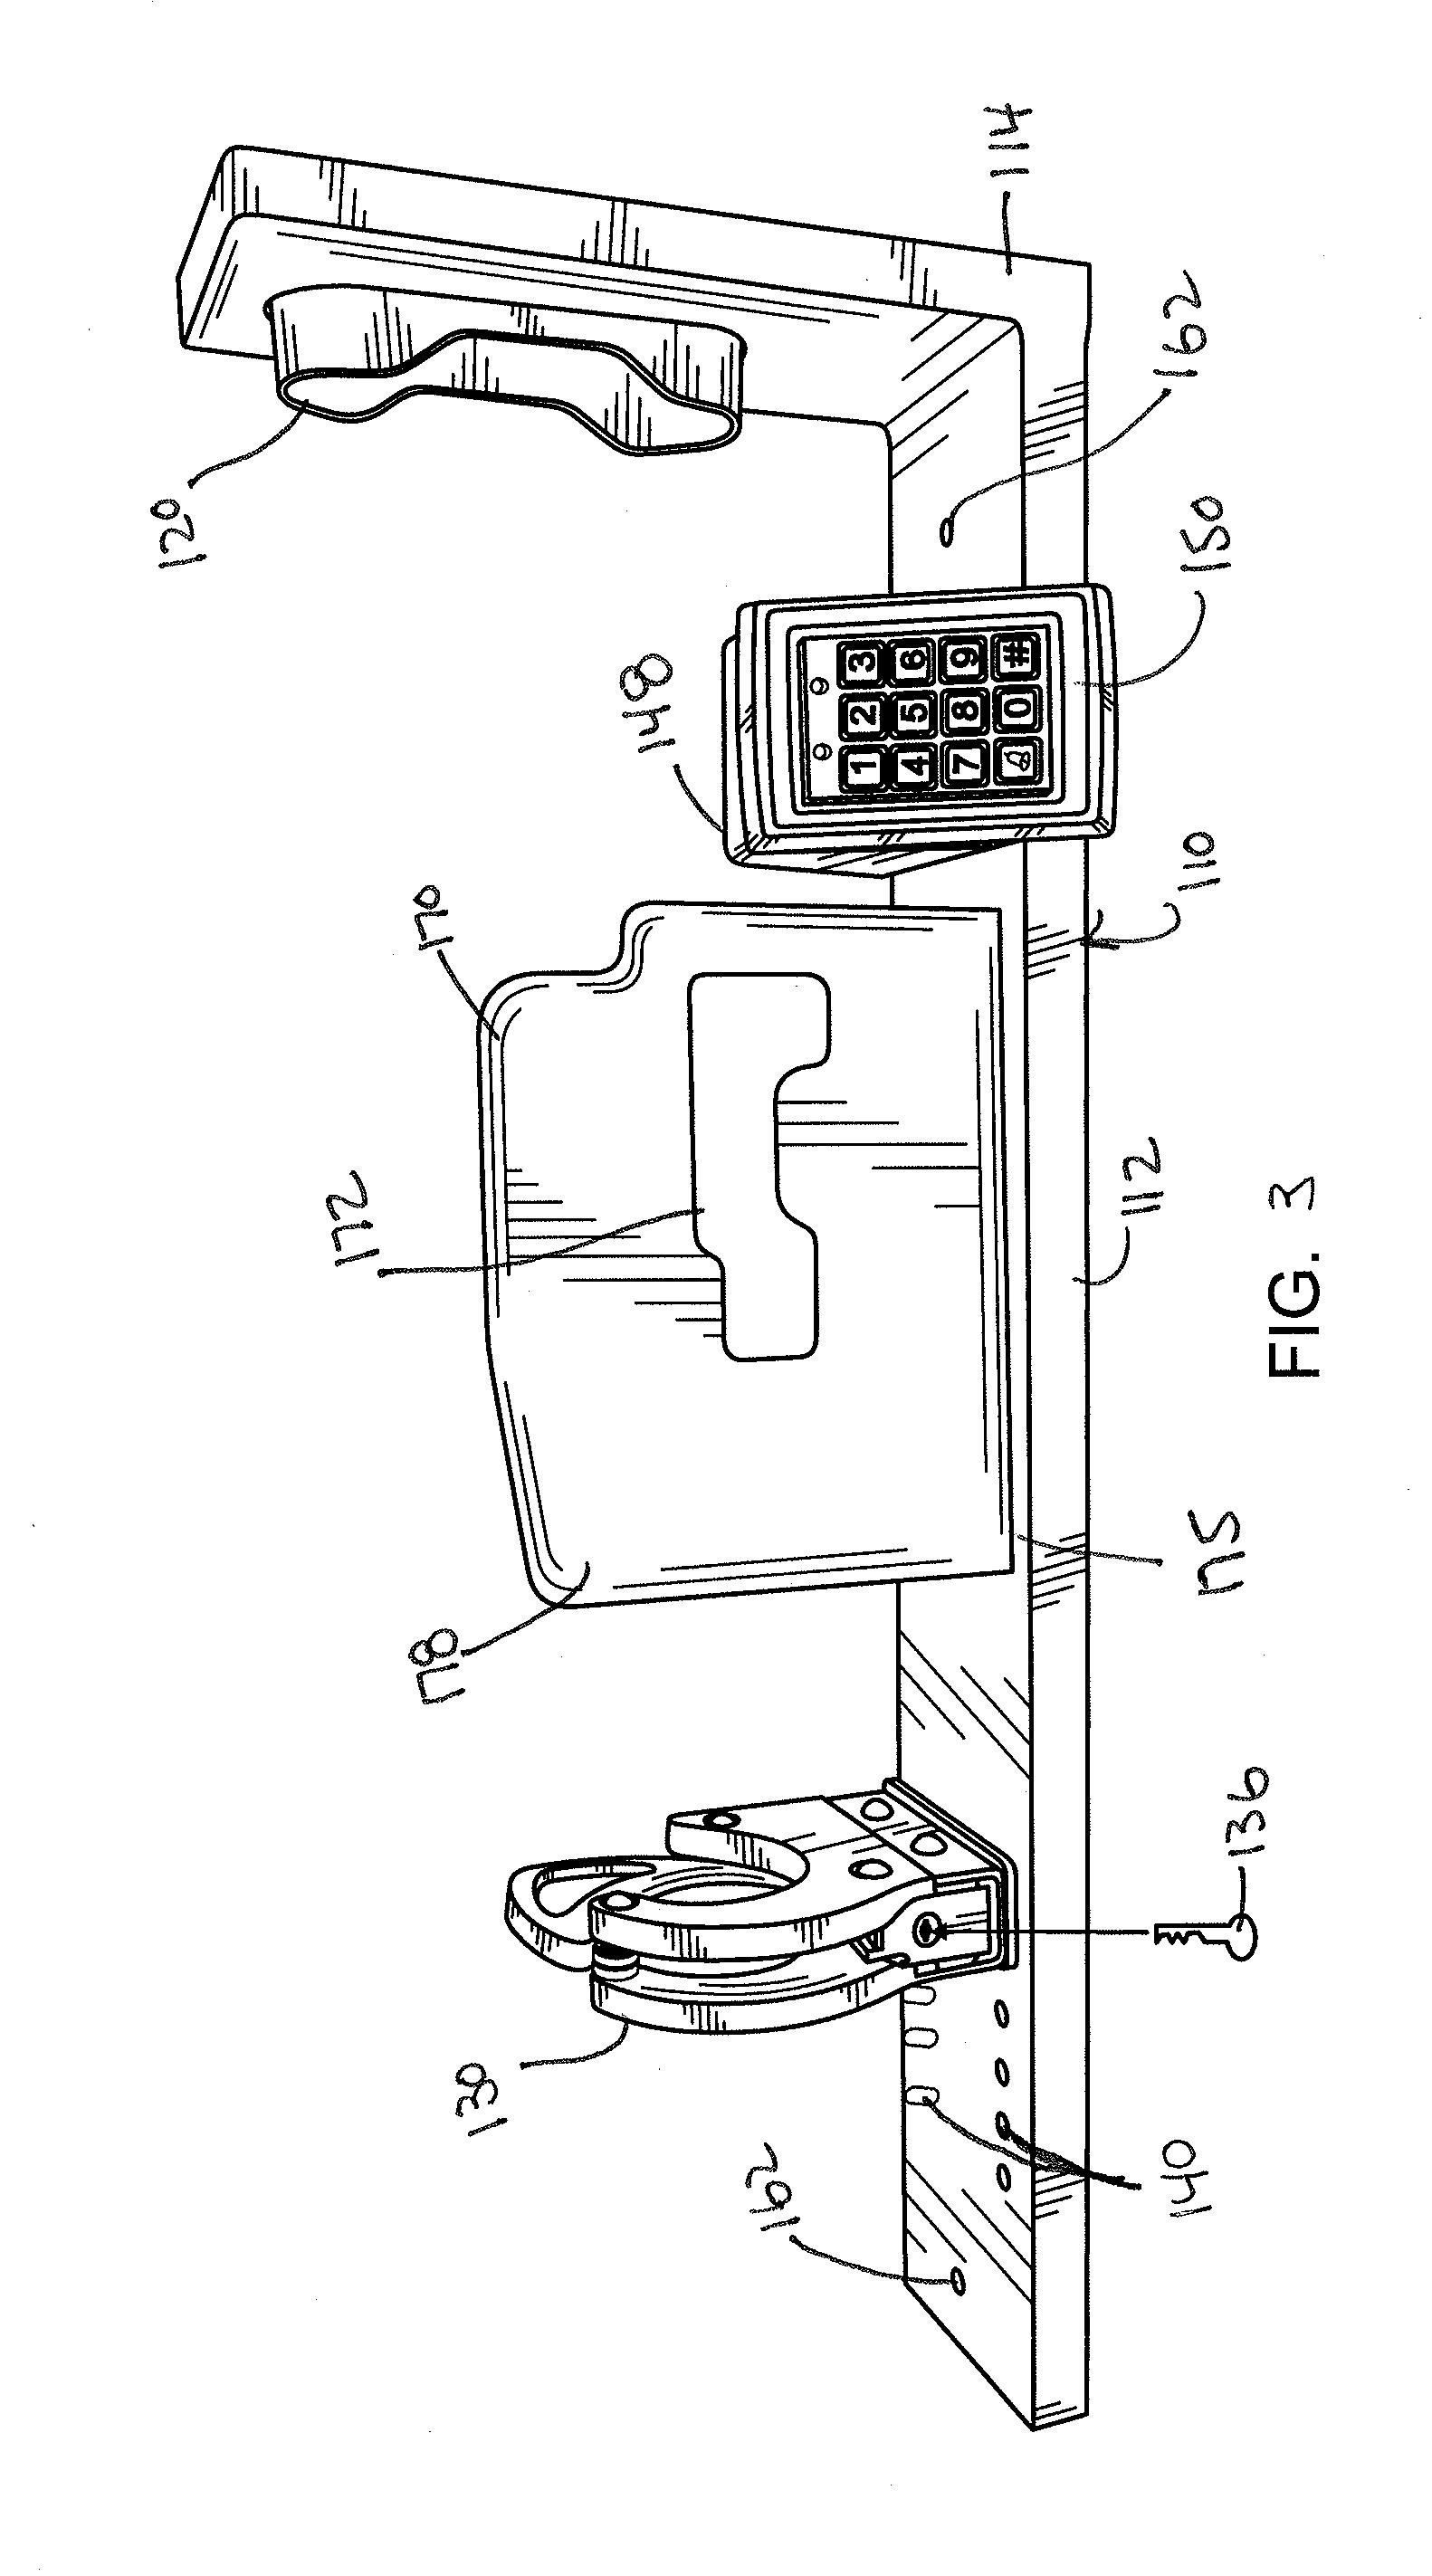 spdt relay wiring diagram lock